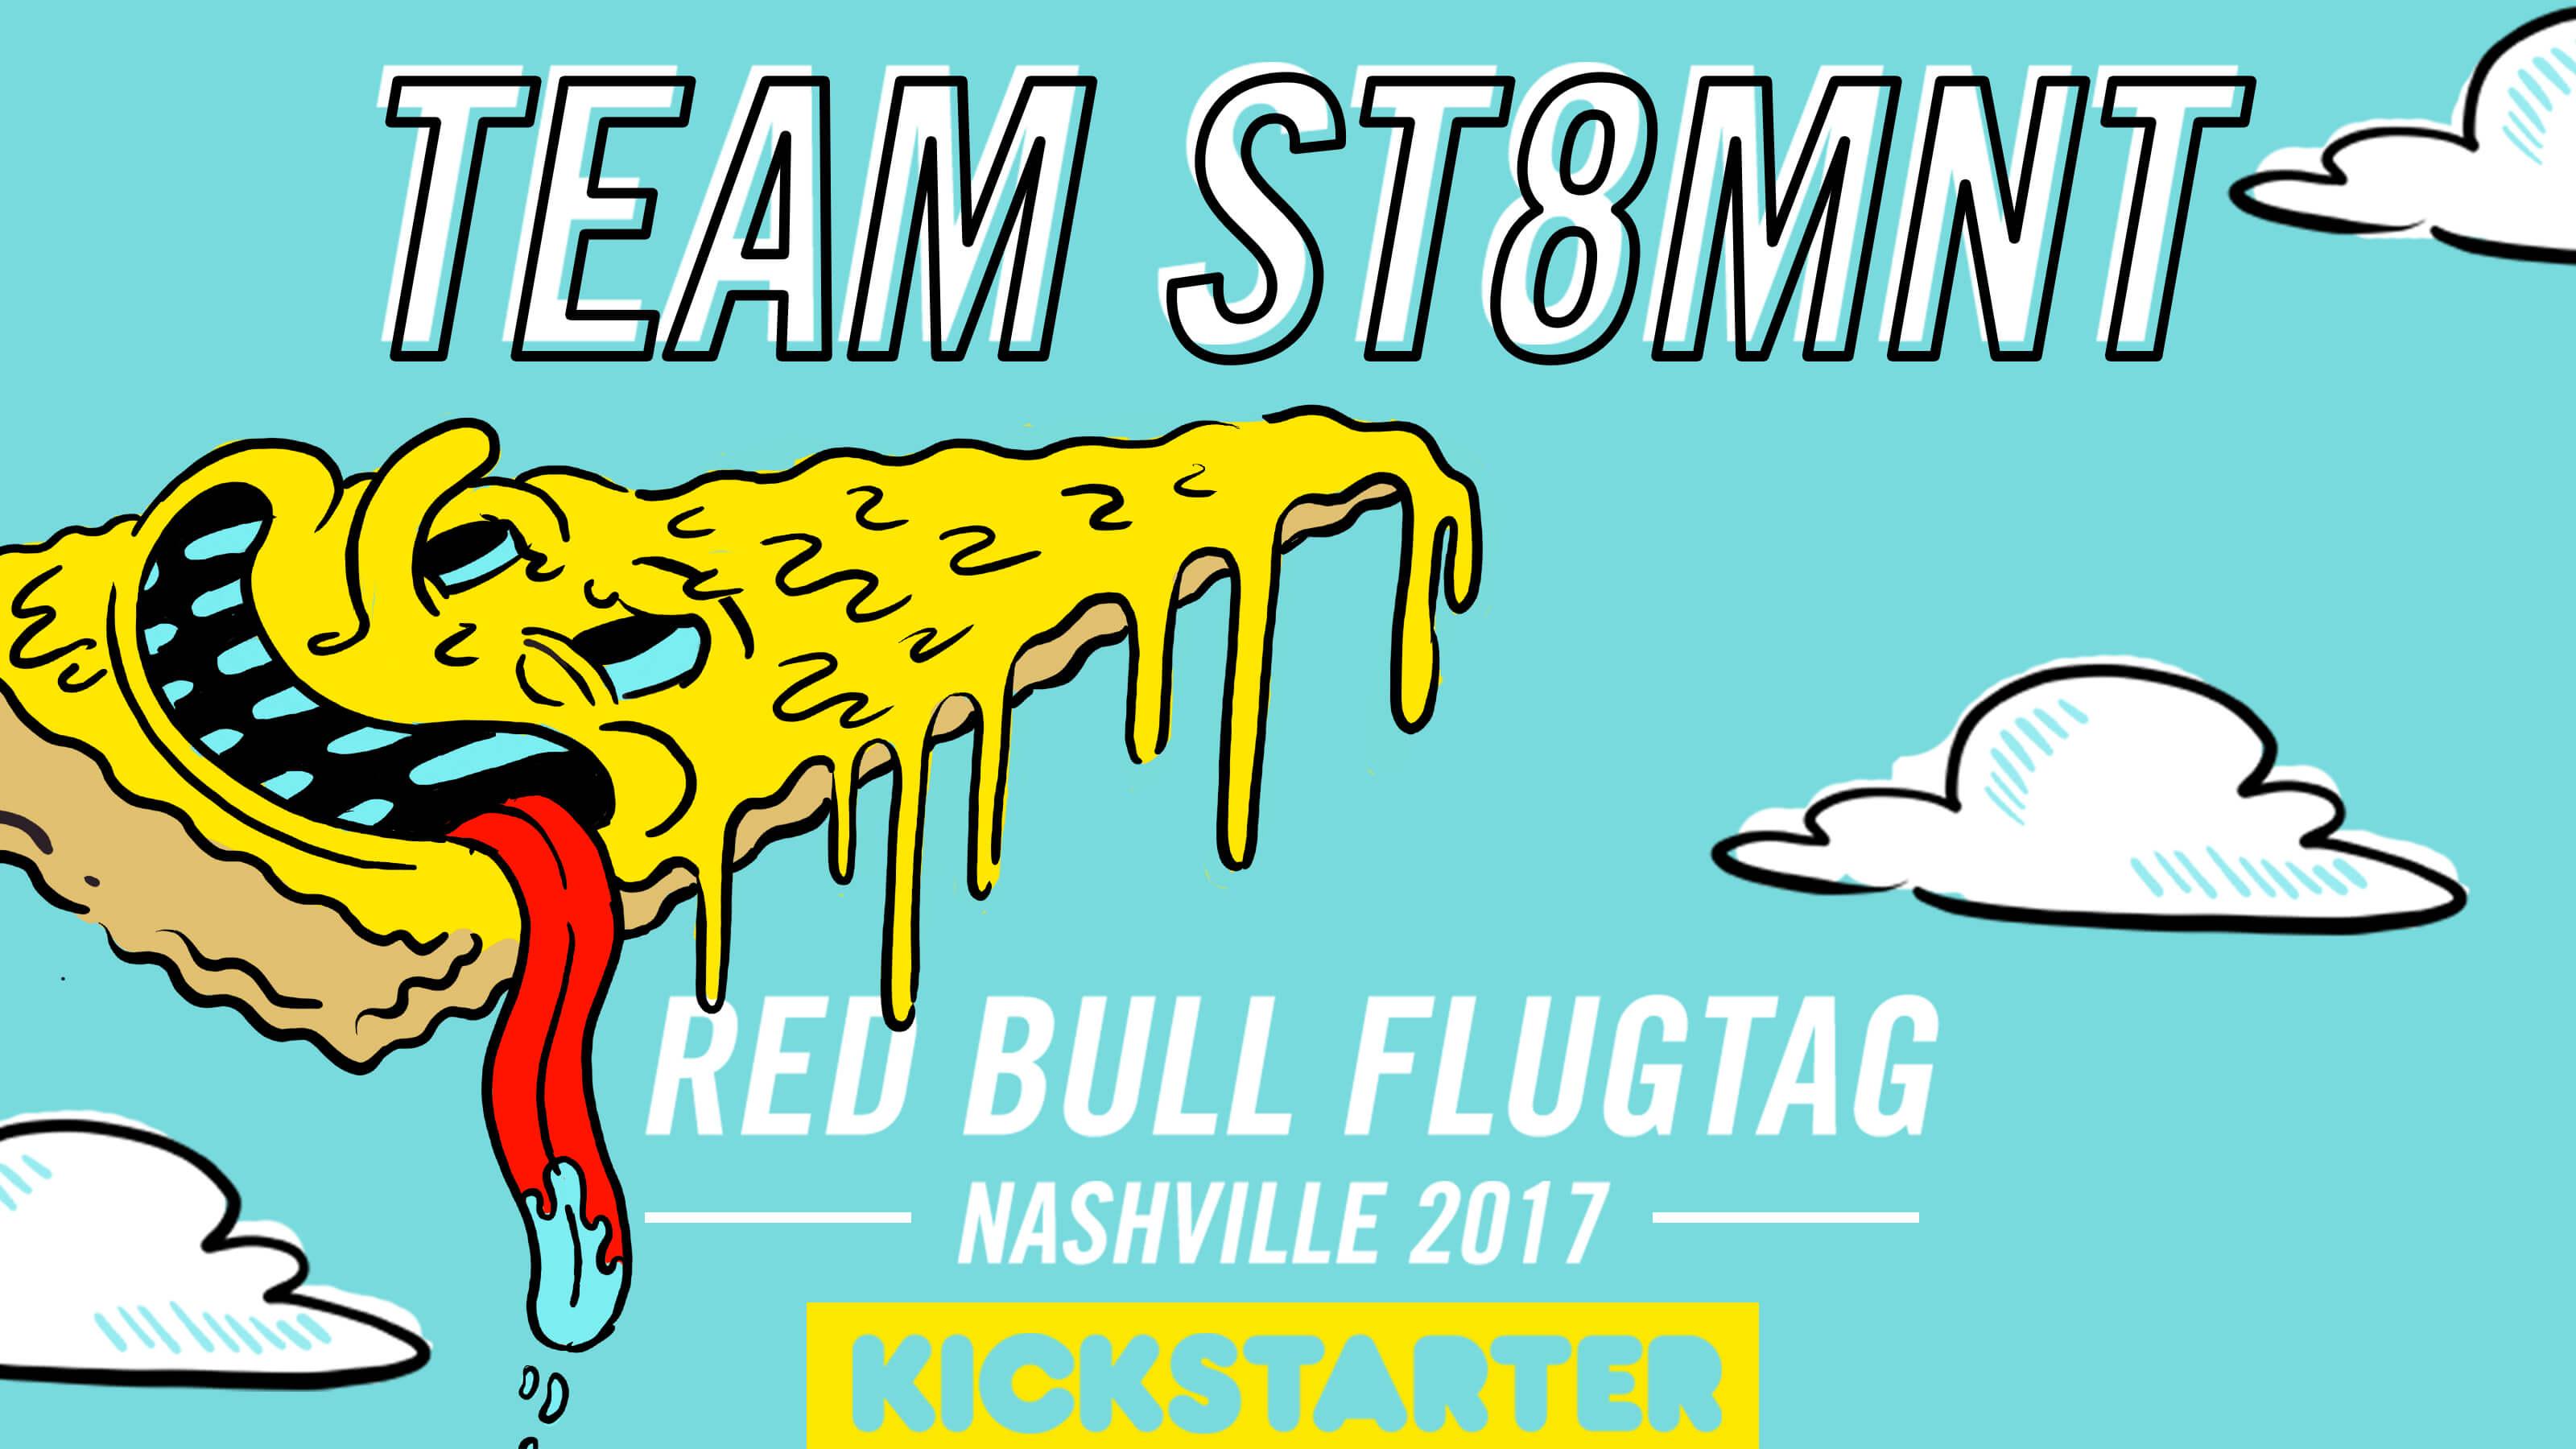 Team ST8MNT Red Bull Flugtag Nashville 2017 Kickstarter graphic